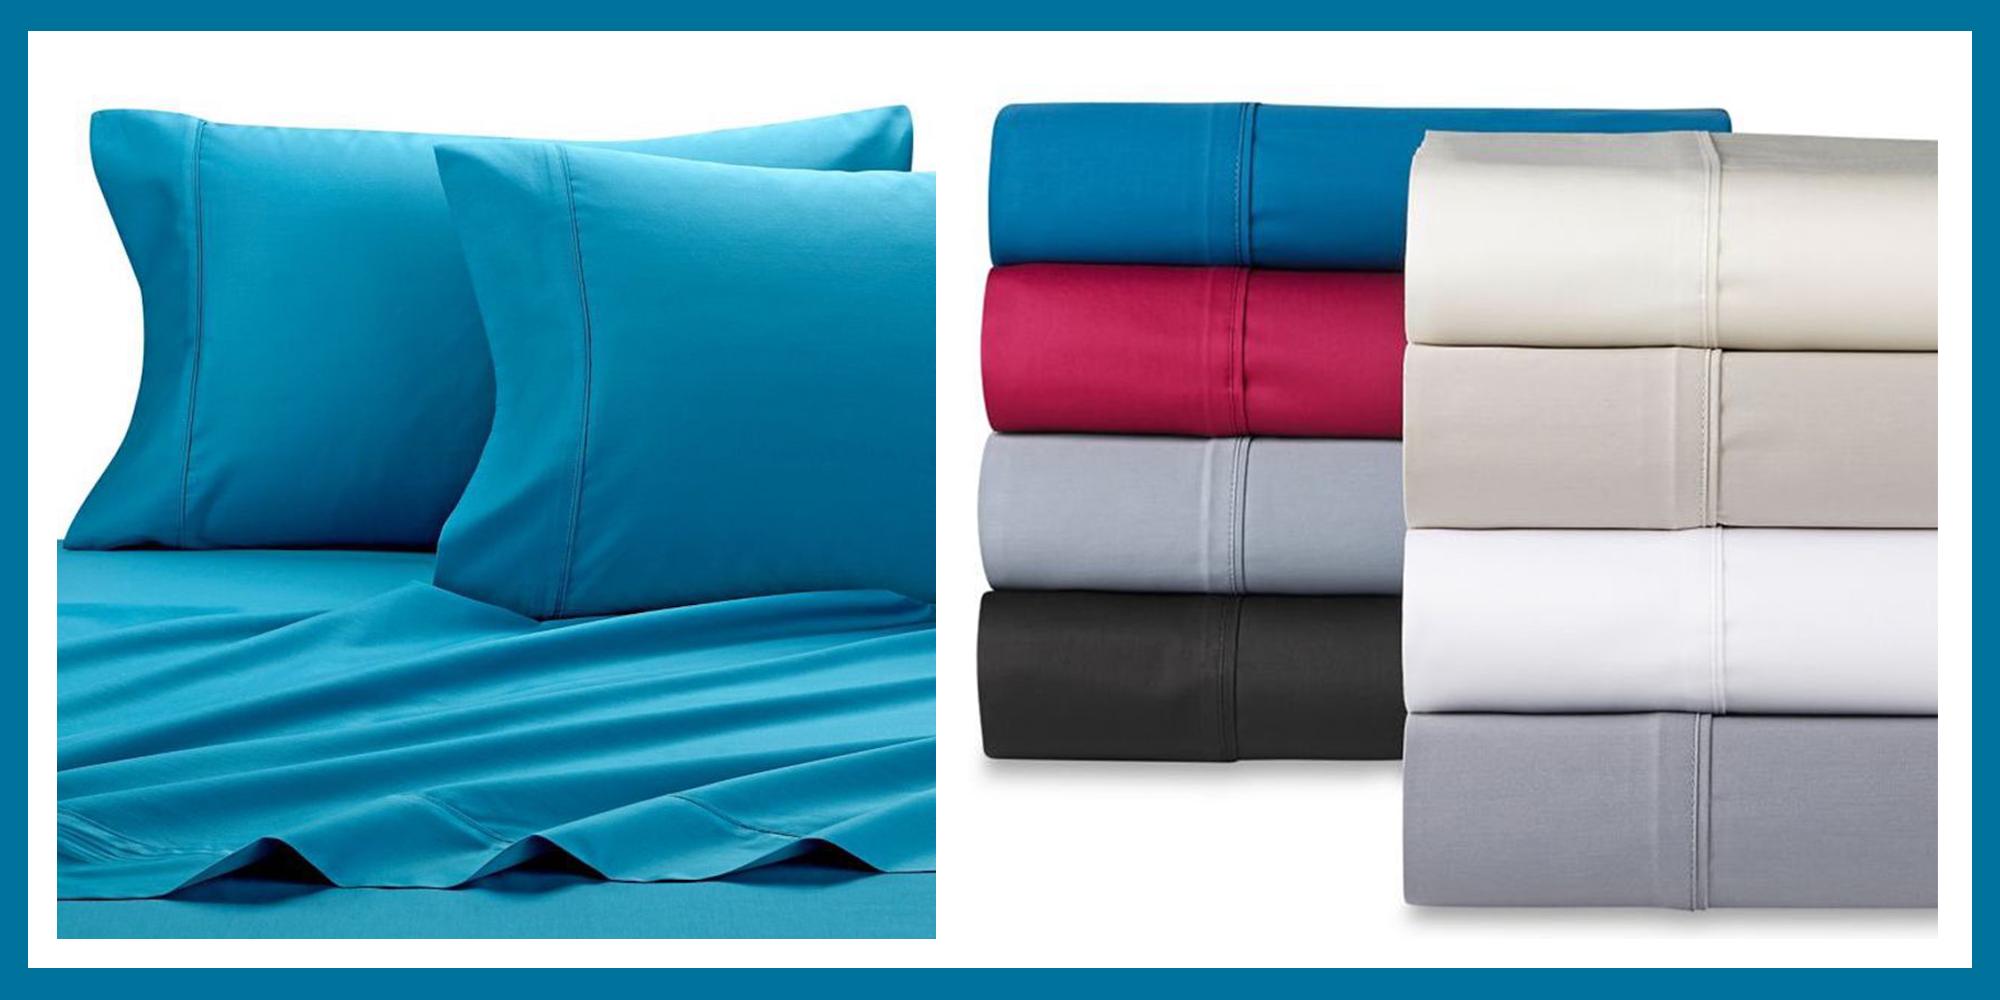 SHEEX Micro Balance 37.5®  AQUA blue King Sheet Set 4PC NEW Performance Fabric